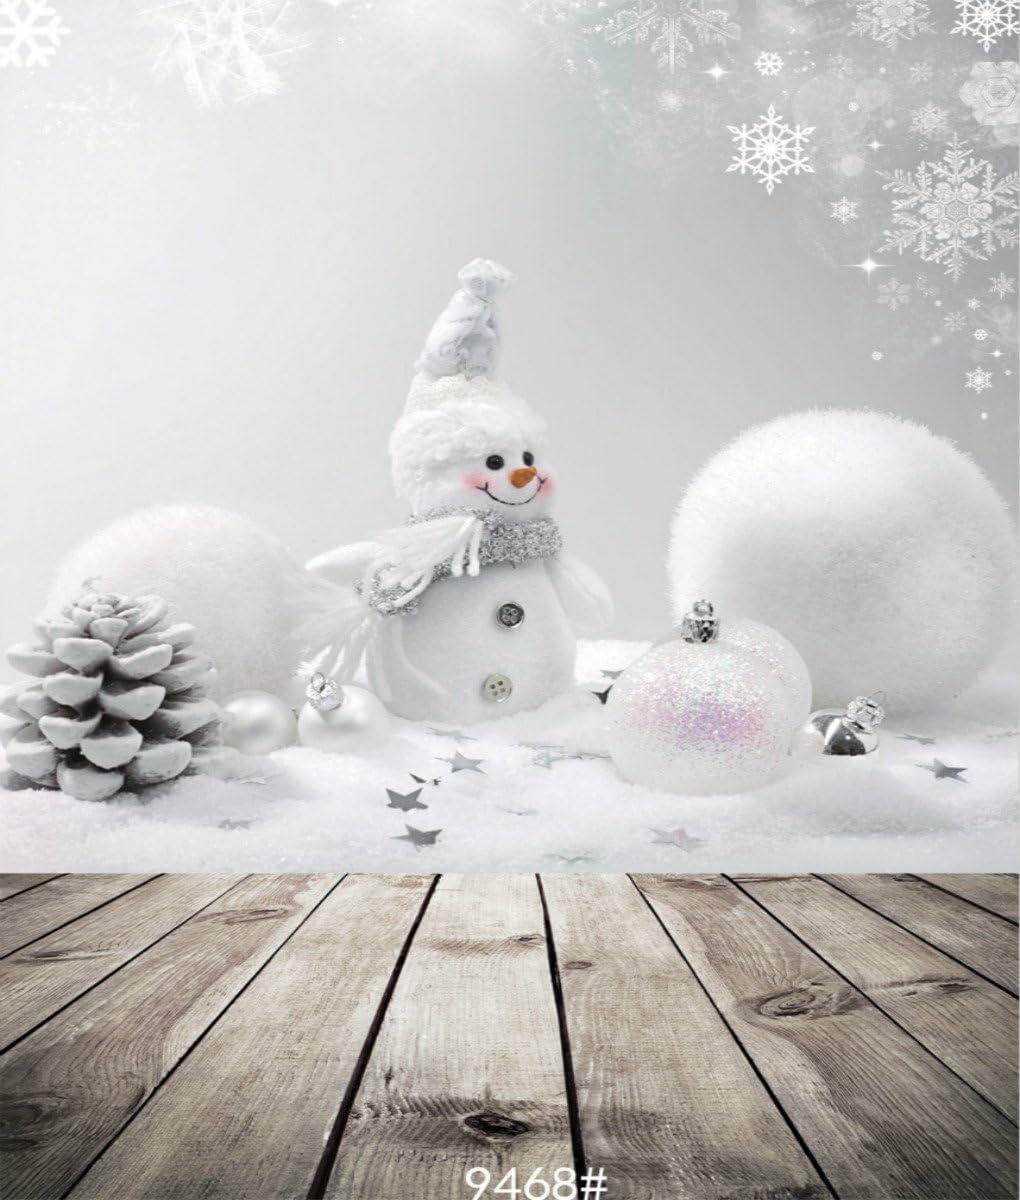 3X4FT-Christmas Snowman Photography Backdrops Wood Floor Photo Studio Background